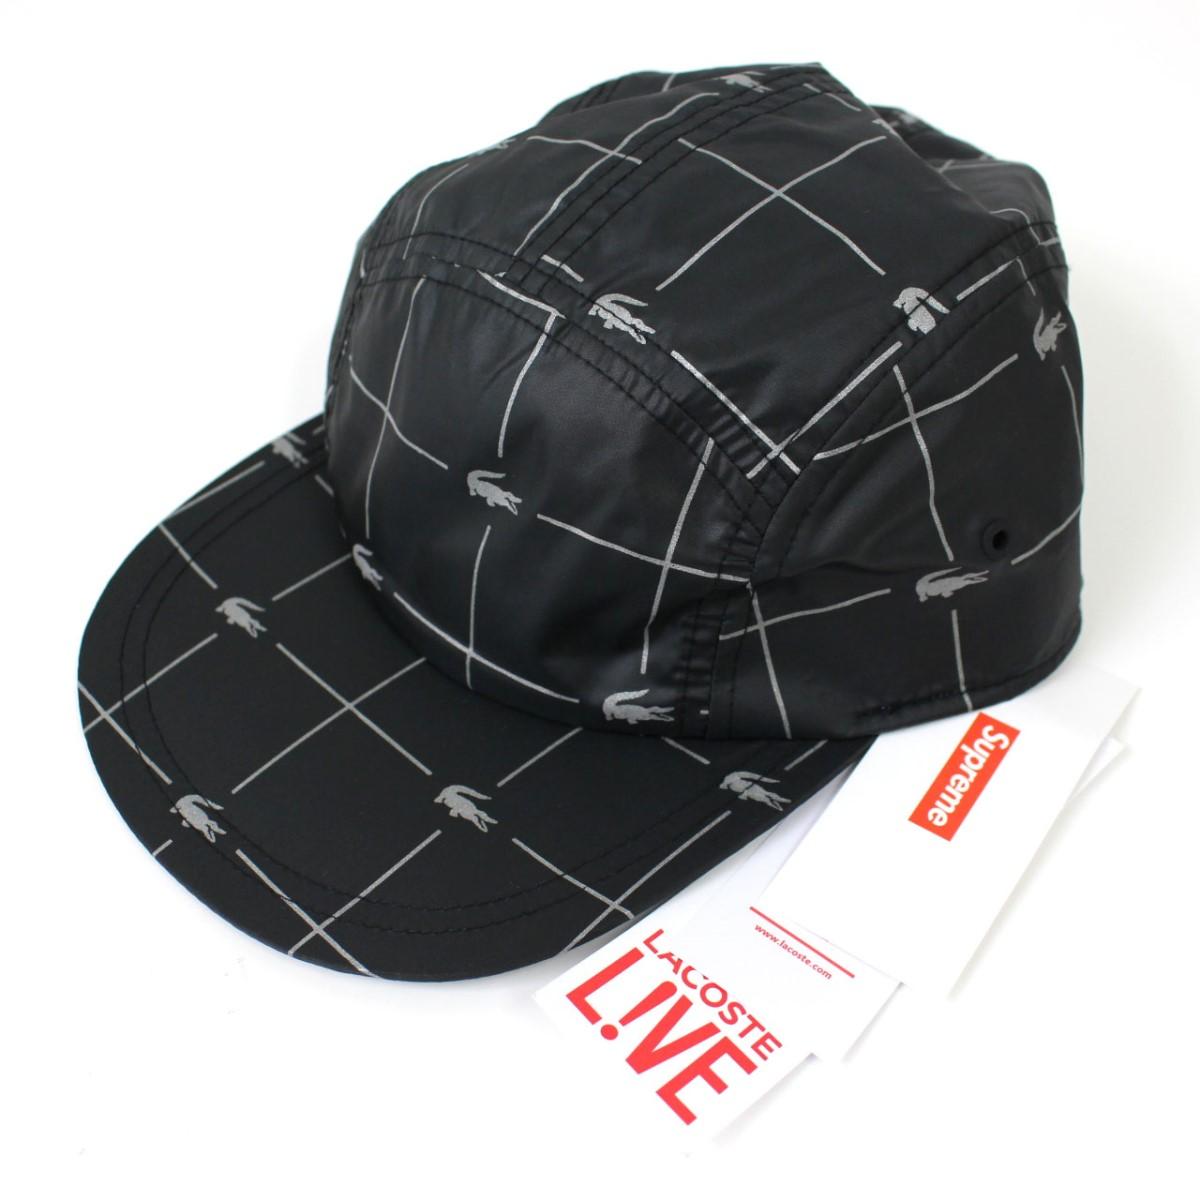 Supreme X Lacoste Reflective Grid Nylon Camp Cap 2018SS nylon cap hat black  X gray size  - (シュプリームラコステ) 0edef5a2b12